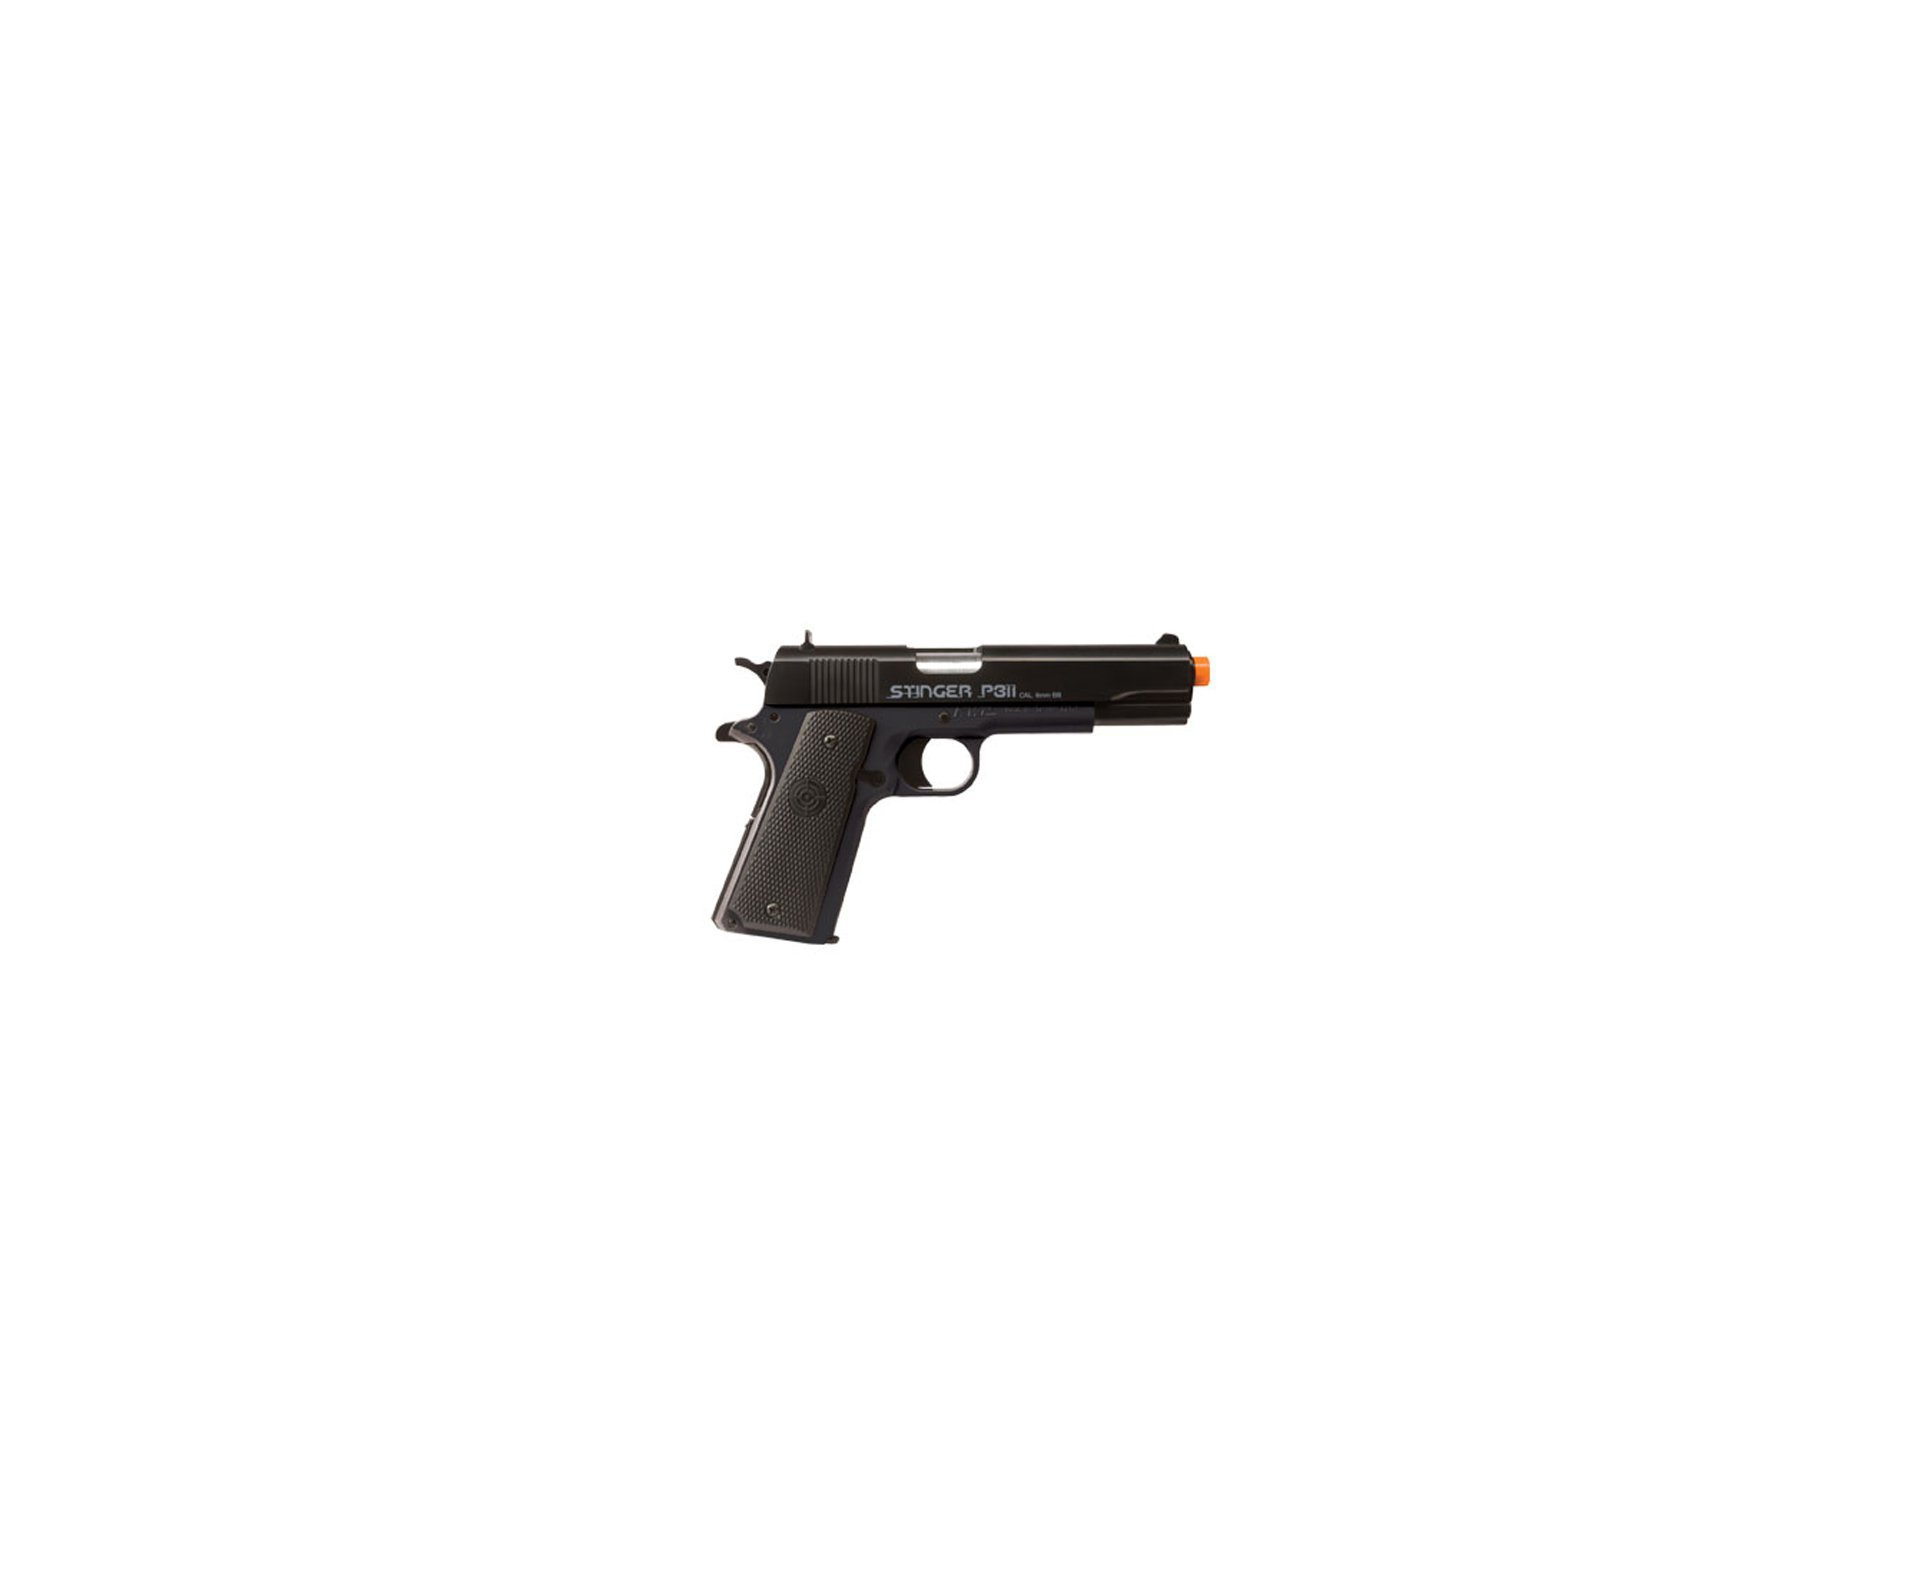 Pistola De Airsoft Stinger P311 - Calibre 6 Mm - Crosman